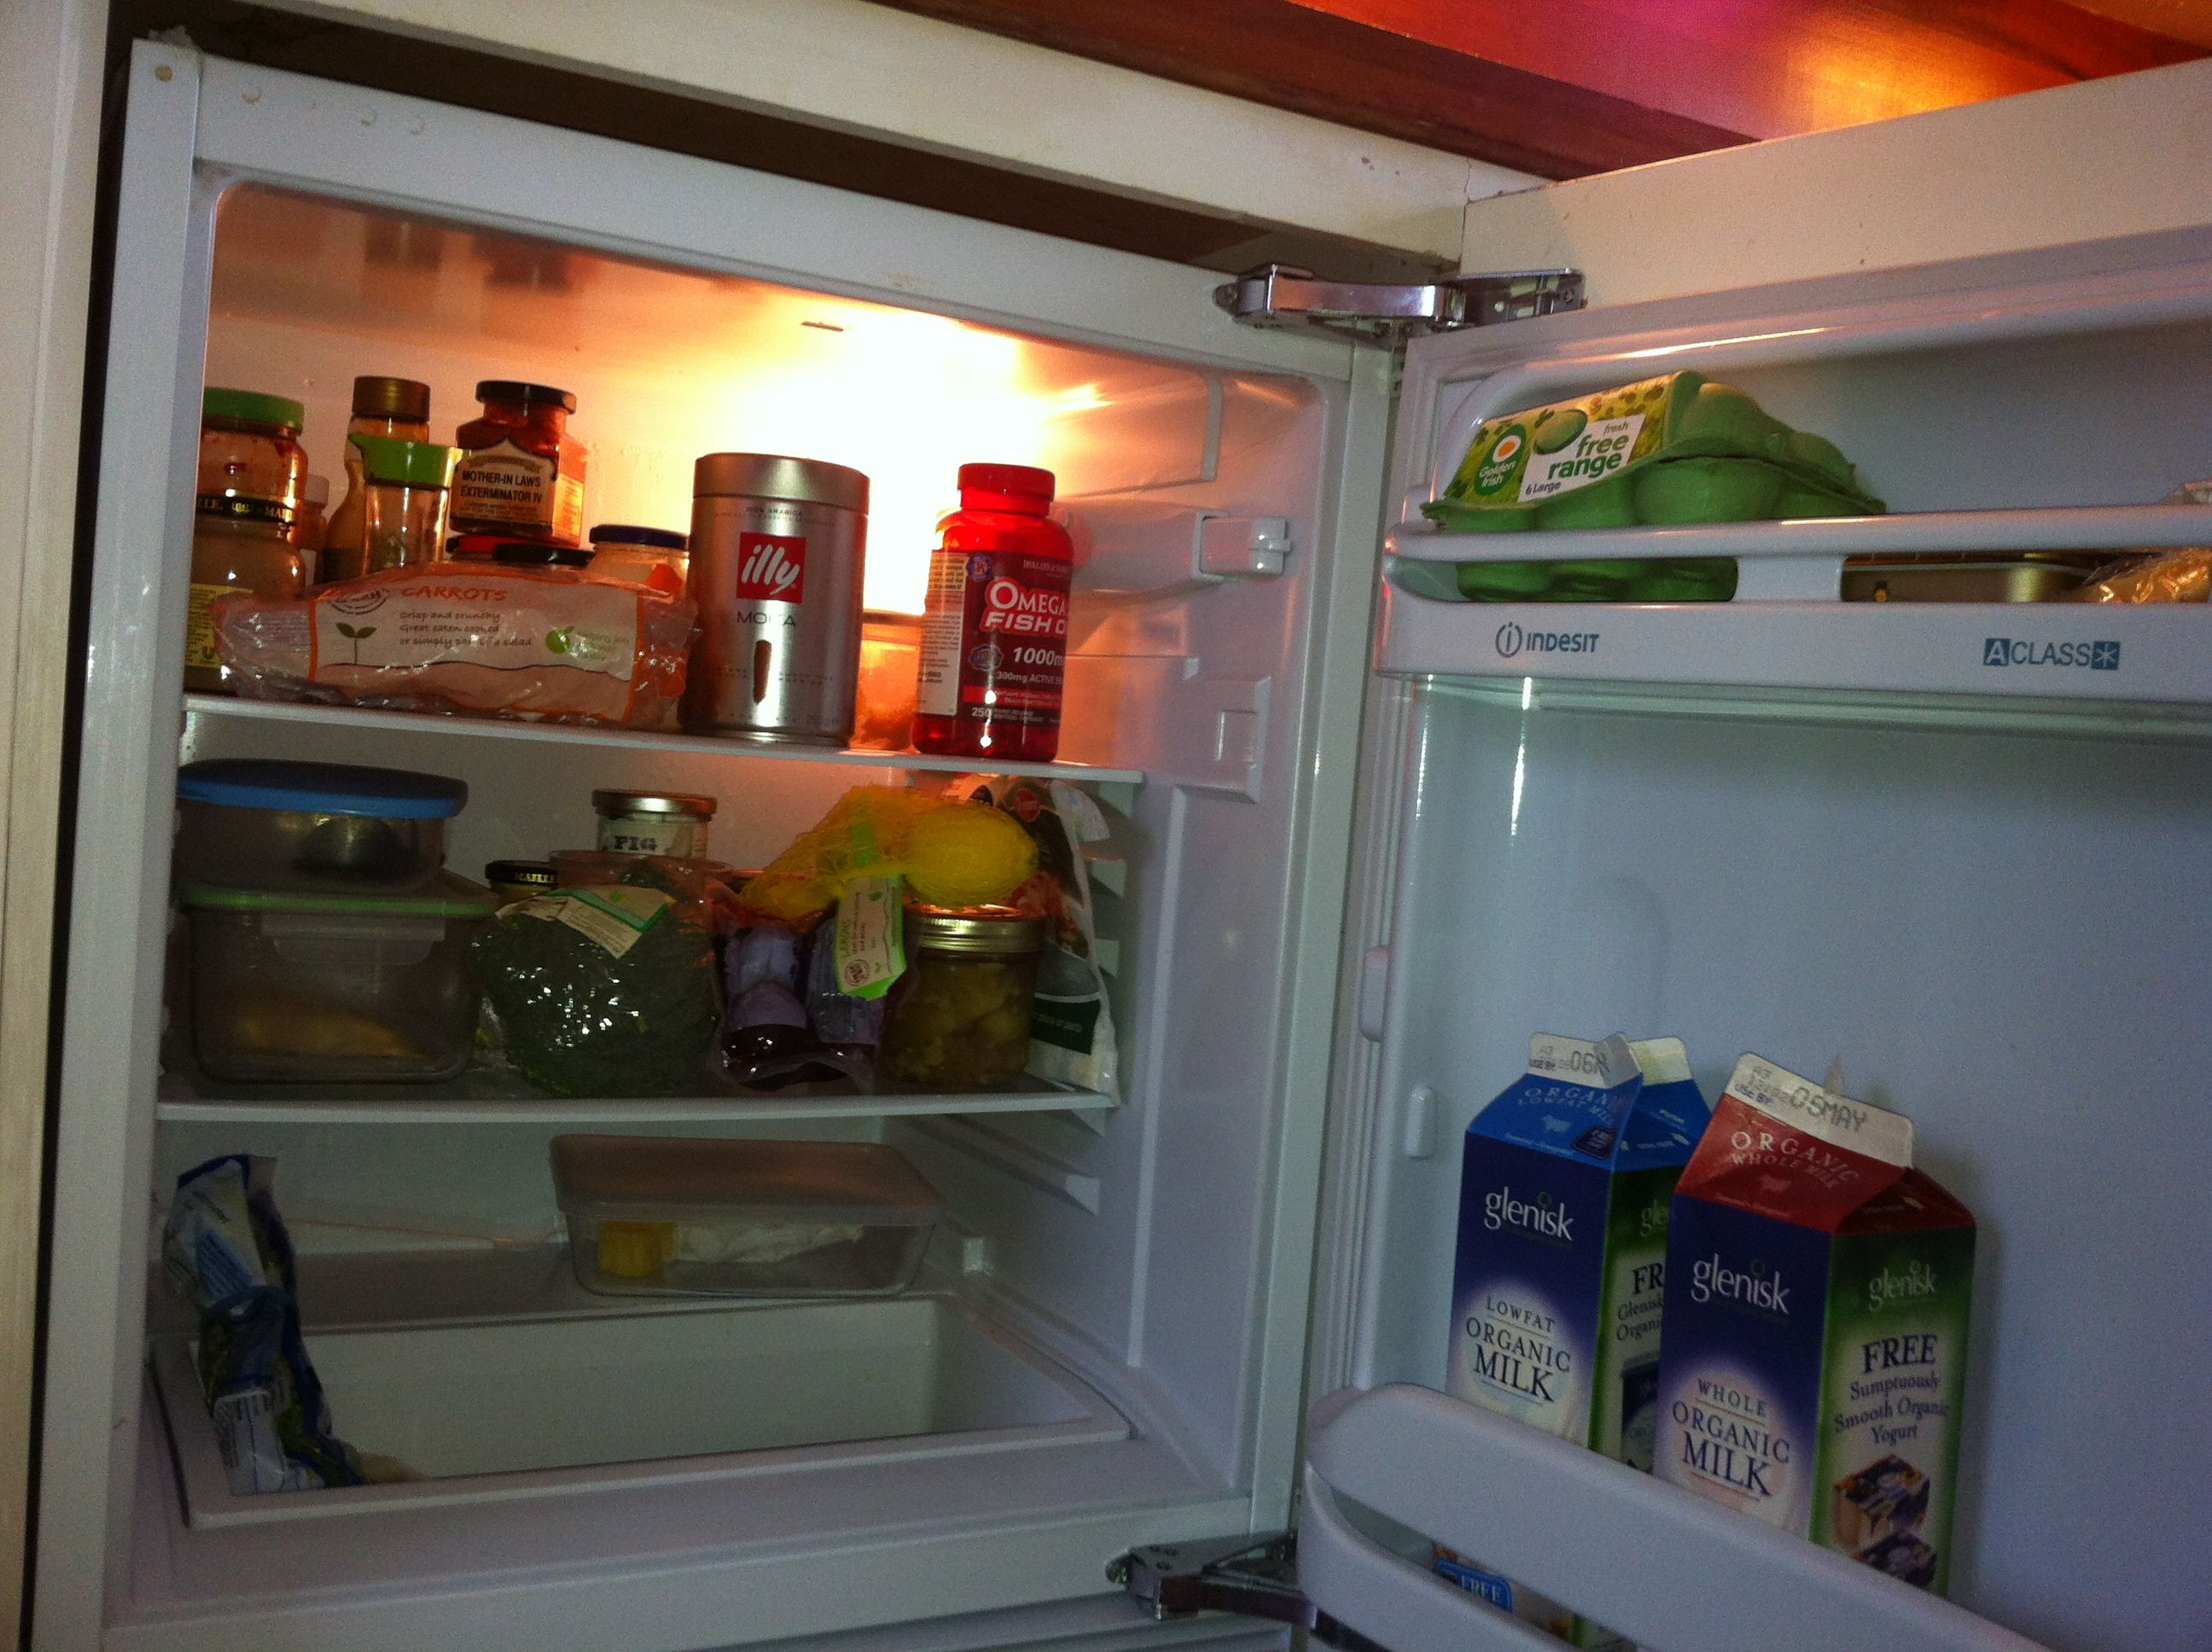 Natalie Harrower's fridge in Dublin, Ireland Top freezer